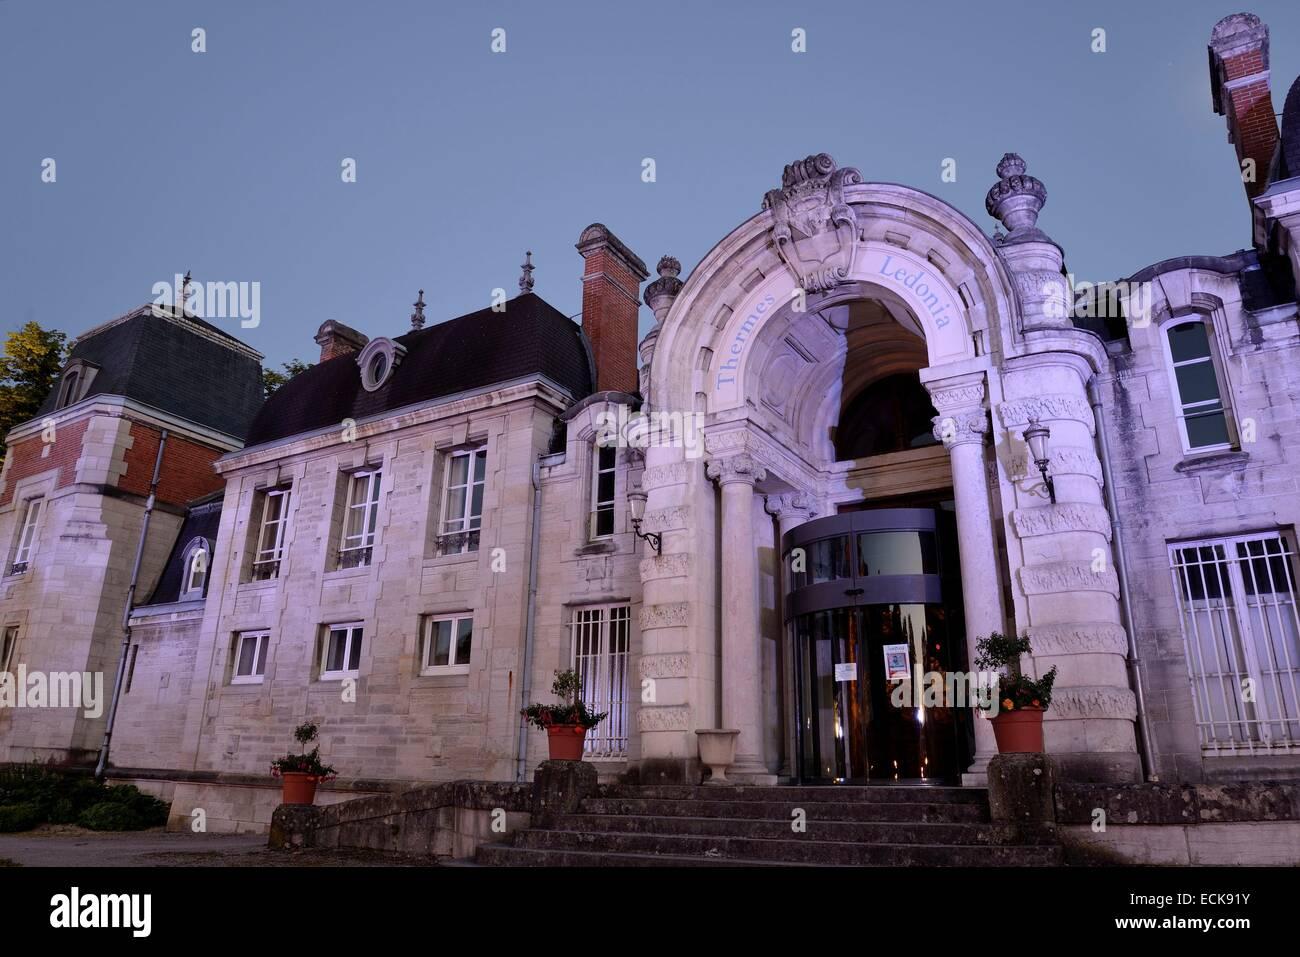 Francia, Jura, Lons Le Saunier, Edward Guenon jardines spa, spas Ledonia fechada del siglo XIX Foto de stock